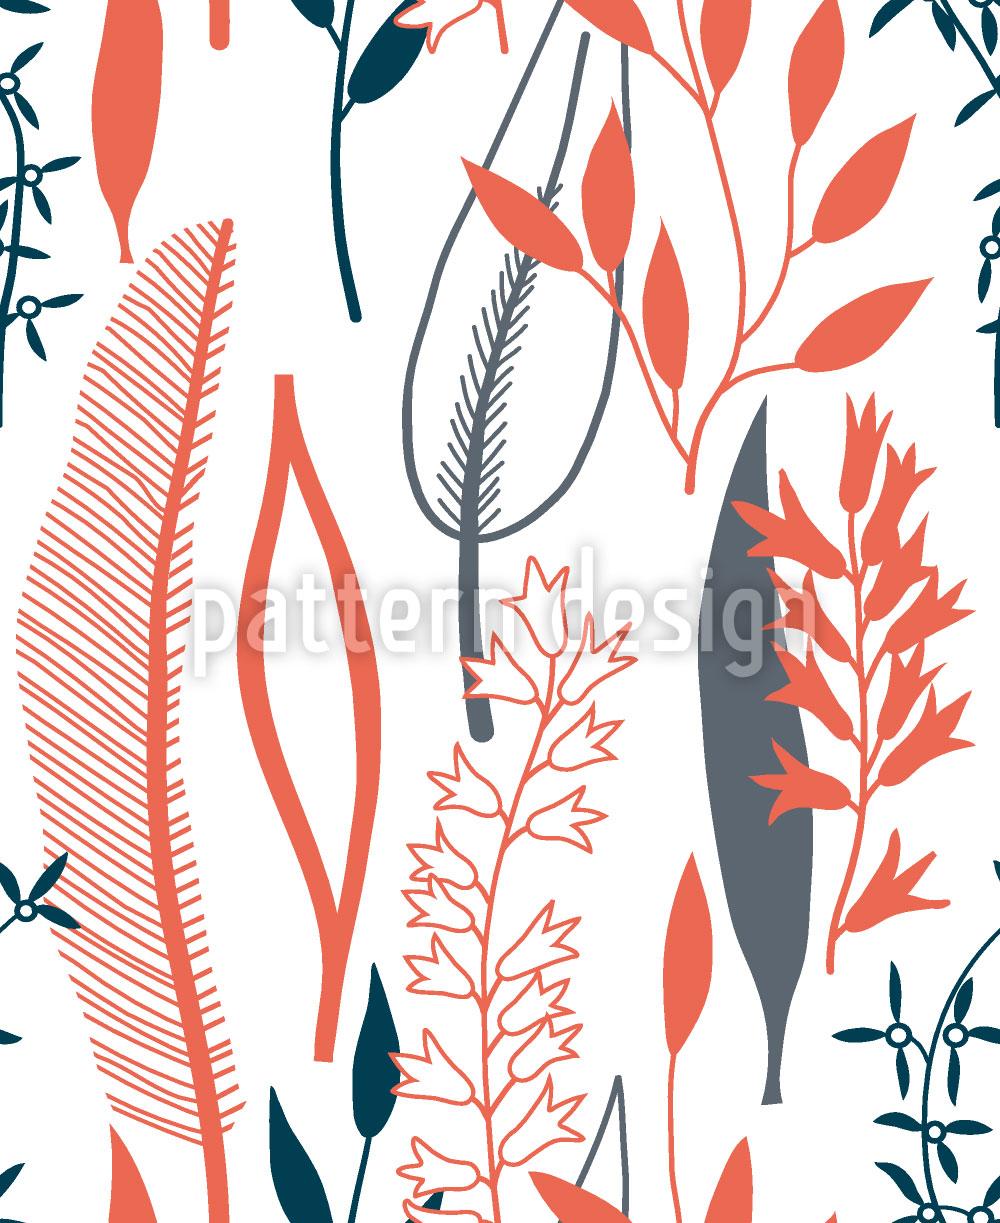 Designtapete Blätter Silhouetten